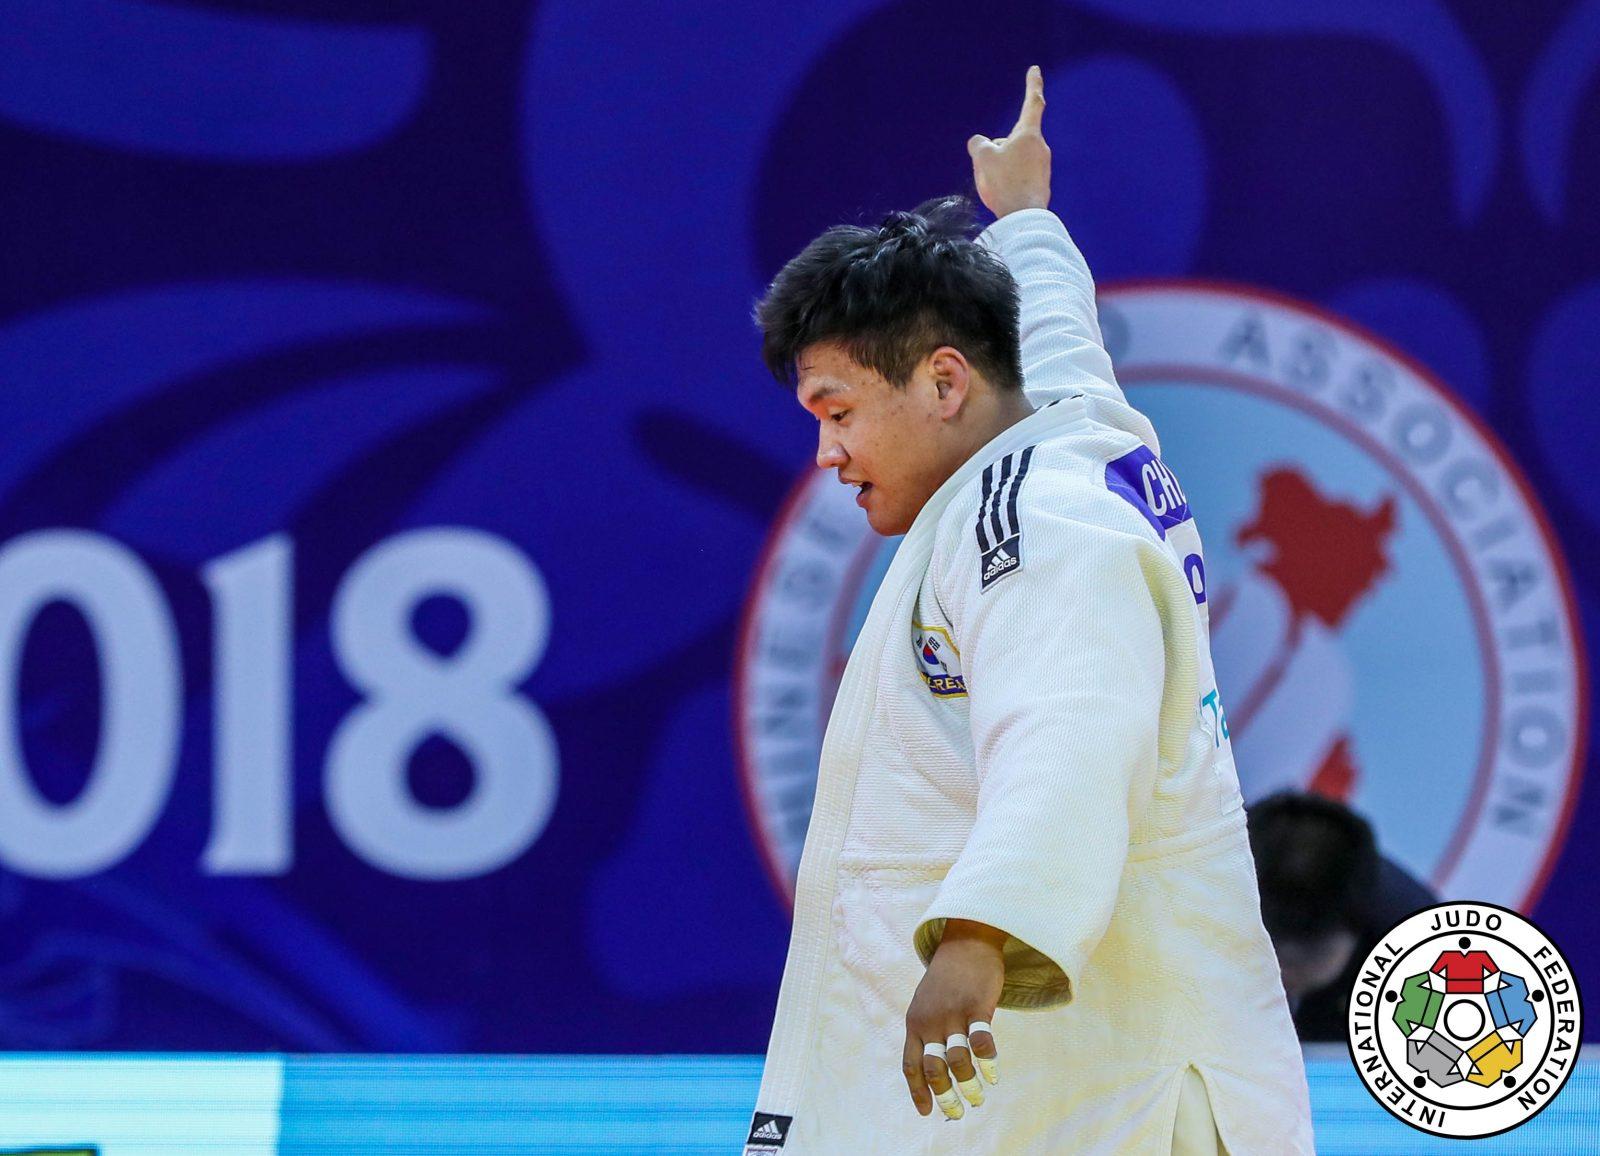 20180527_hohhotgp_ijf_day3_final_100_cho_guham_win